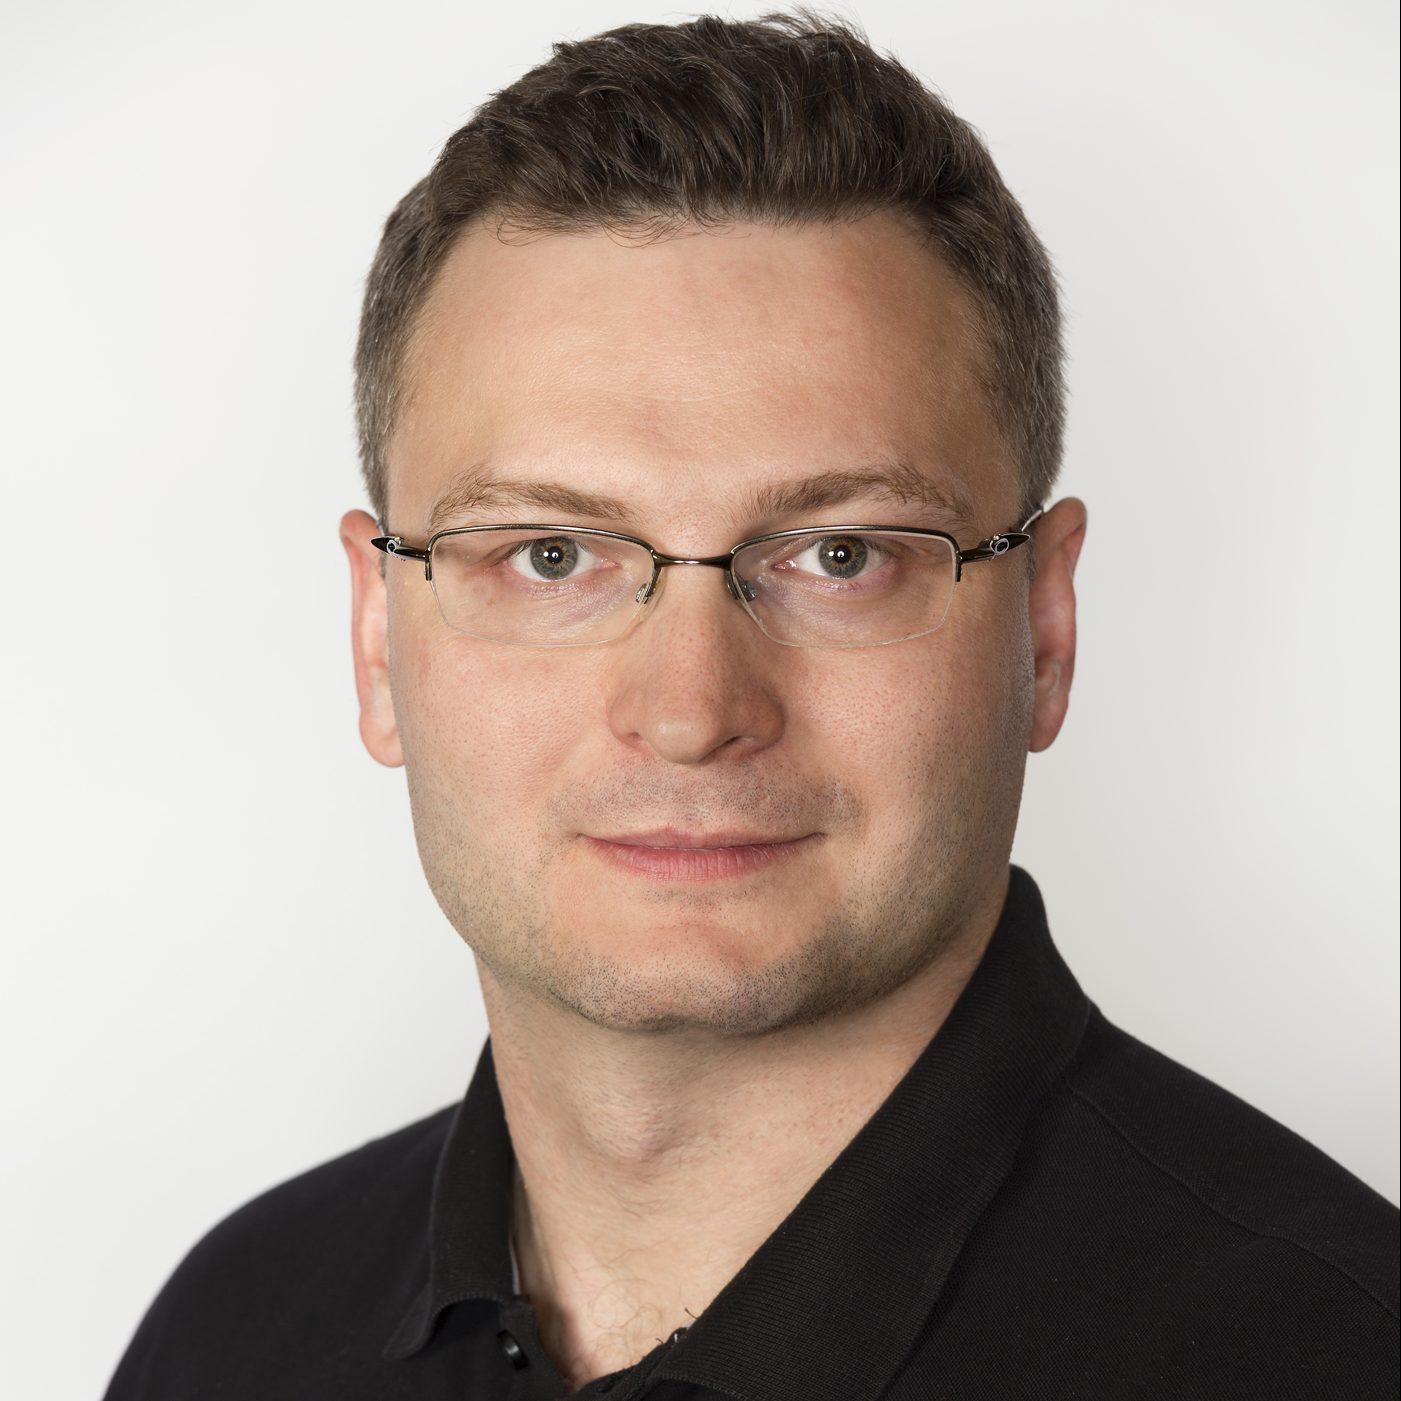 Vladimir Lounegov